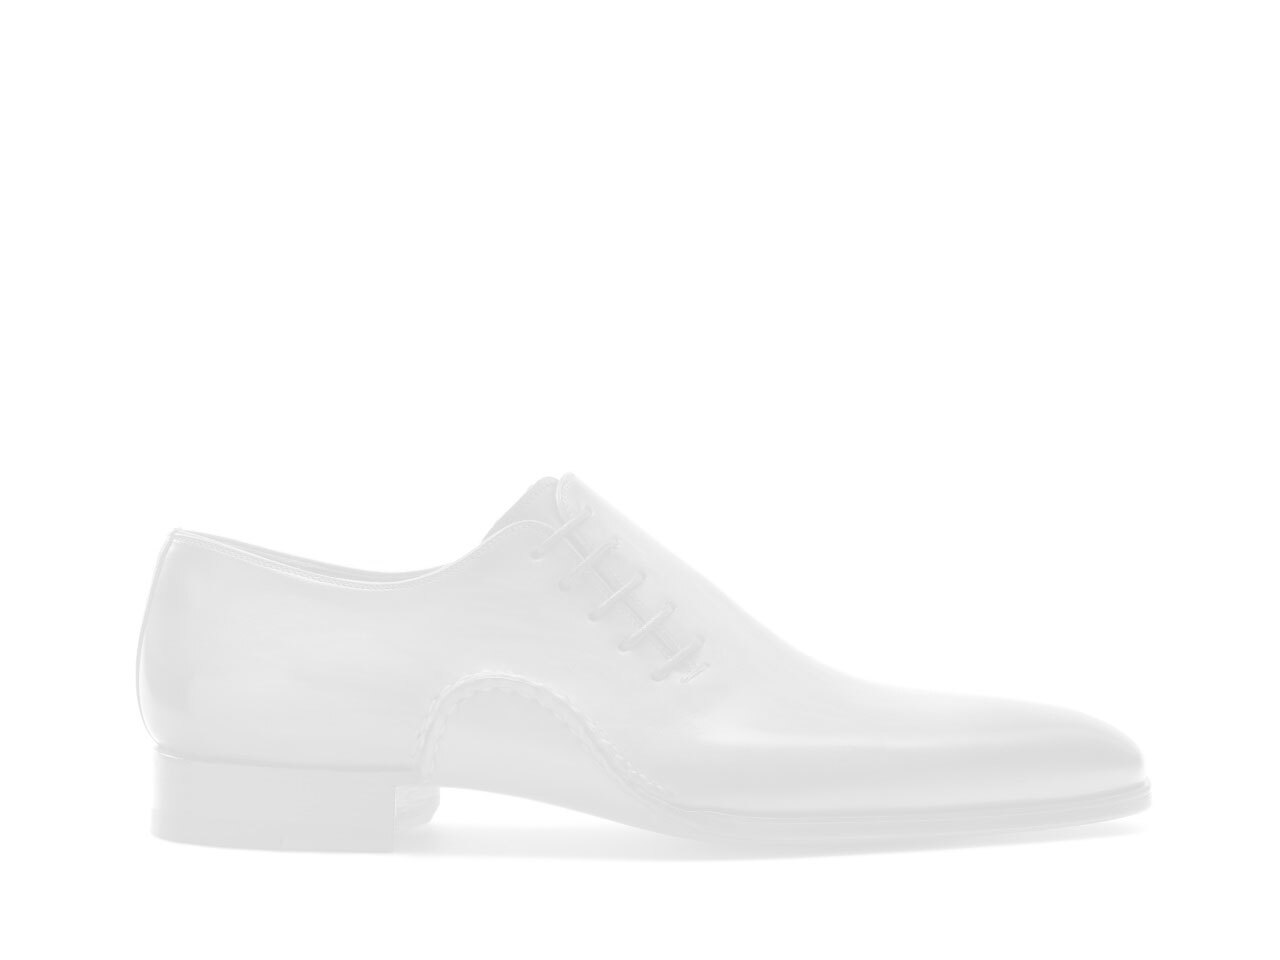 Pair of the Magnanni Carrera Curri Men's Single Monk Strap Shoes